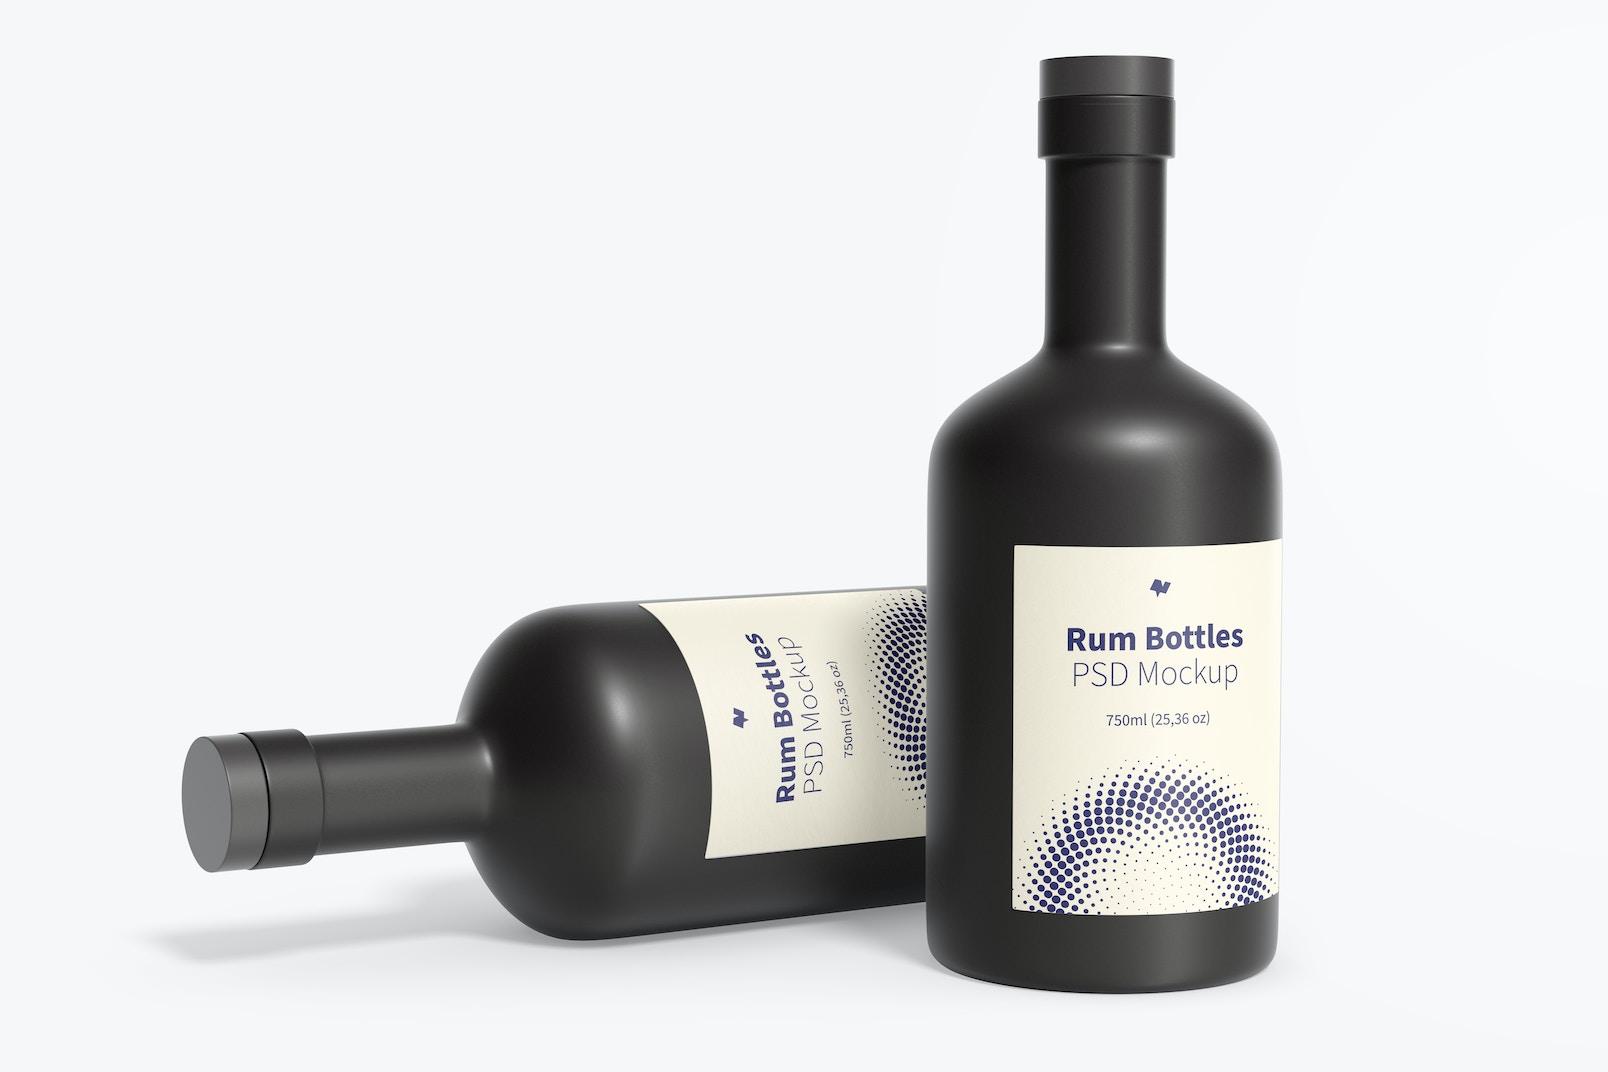 Rum Bottles Mockup